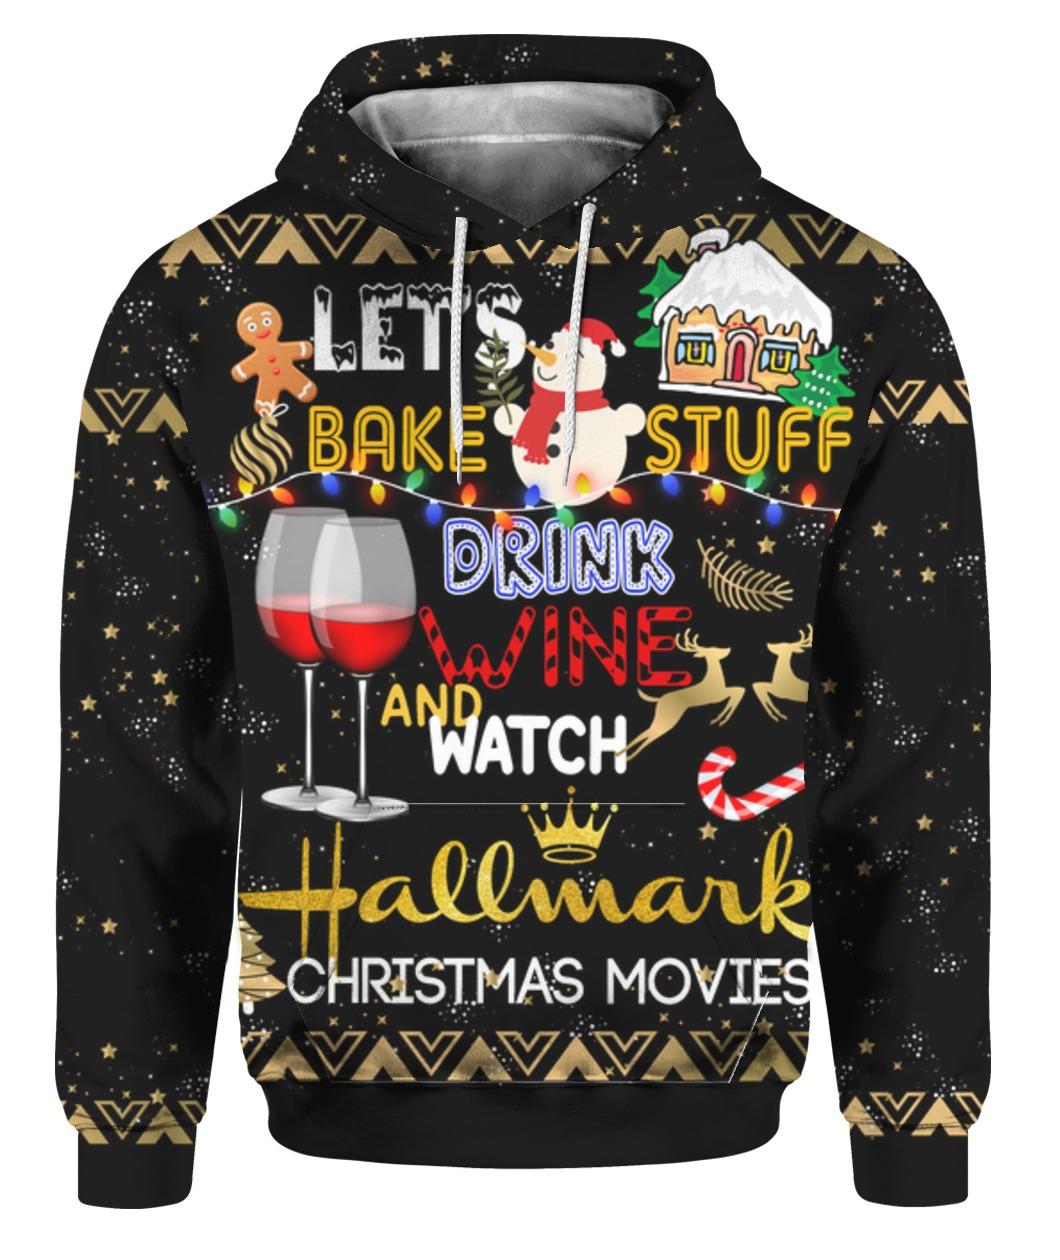 Let's bake stuff drink wine watch hallmark christmas movies full printing shirt - maria